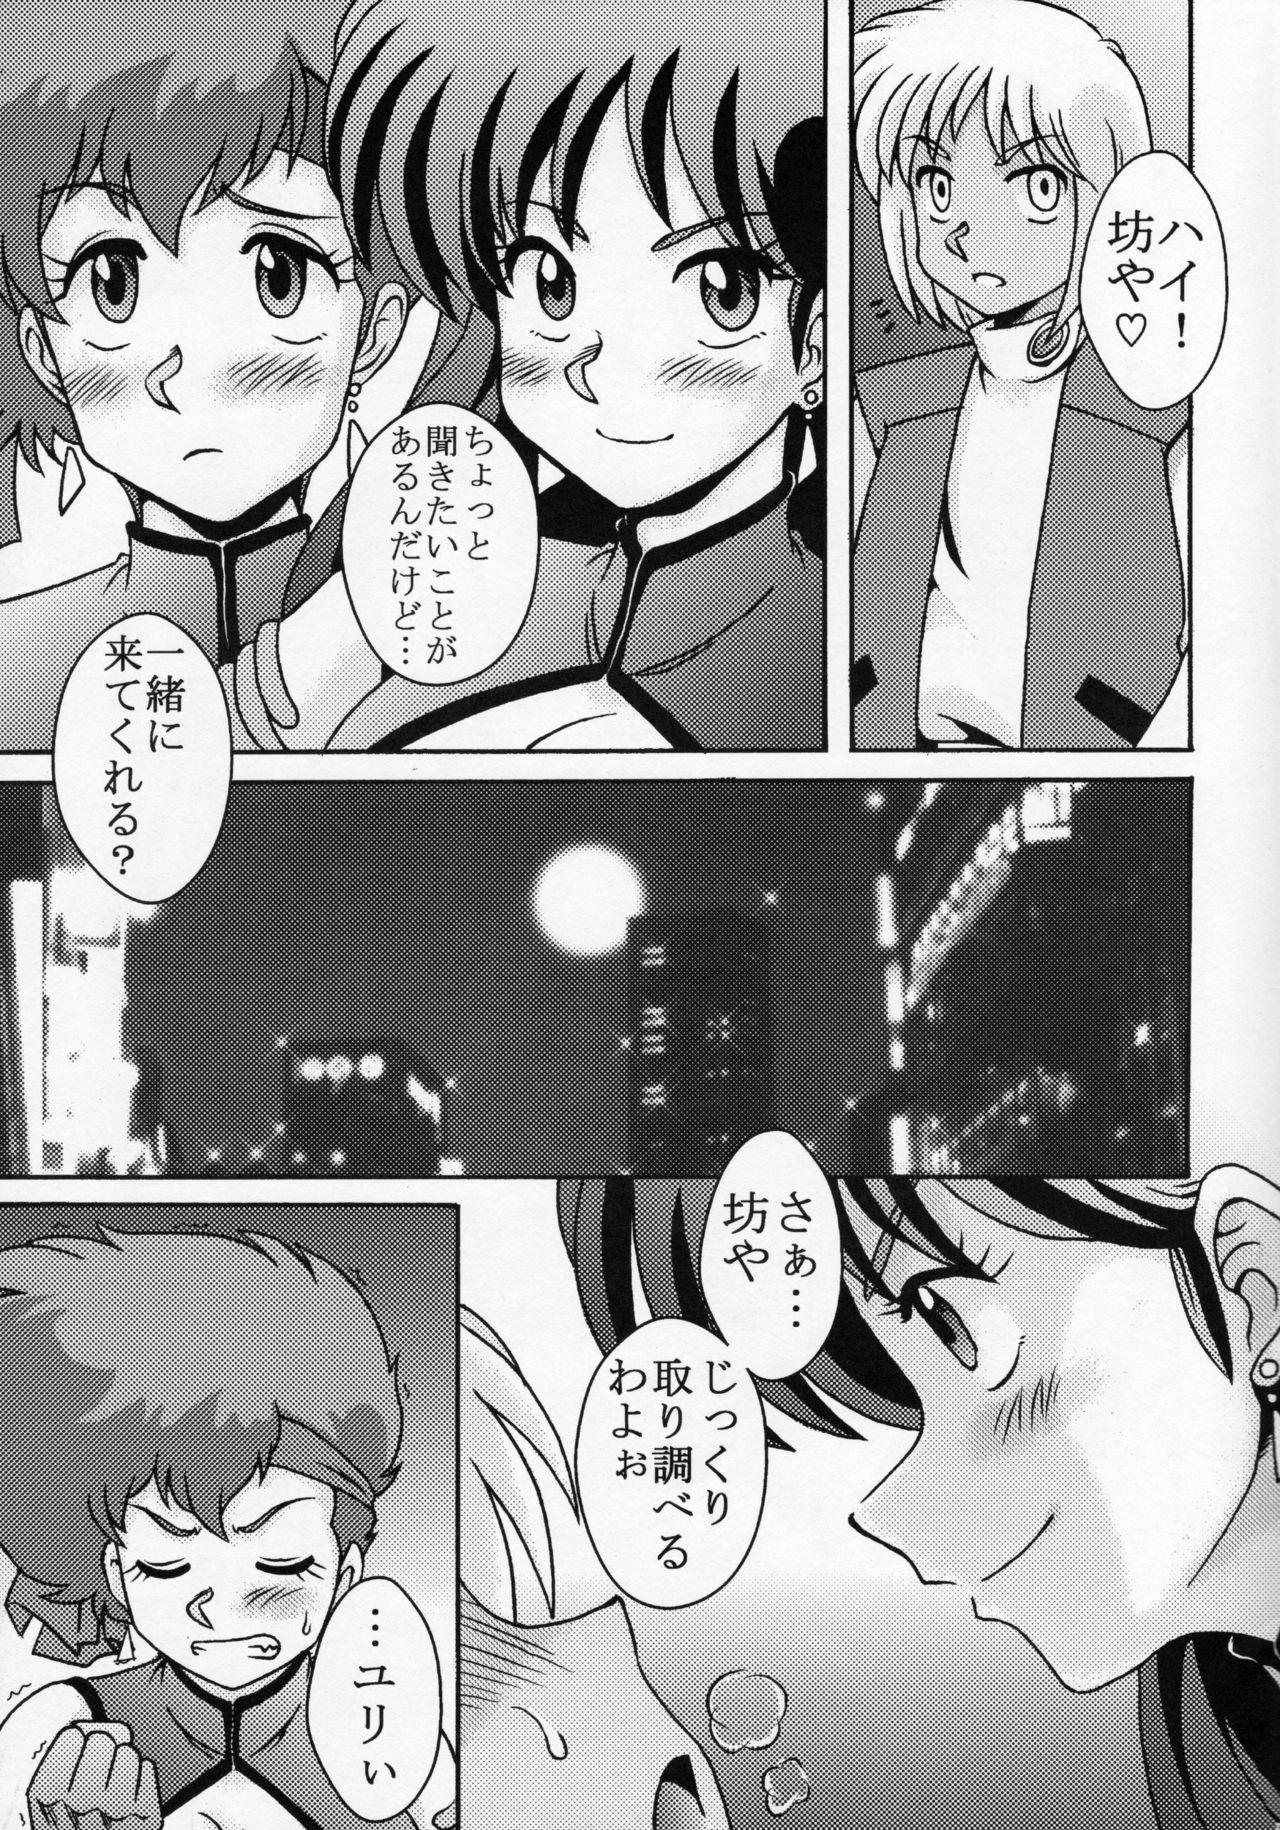 Kei to Yuri 3